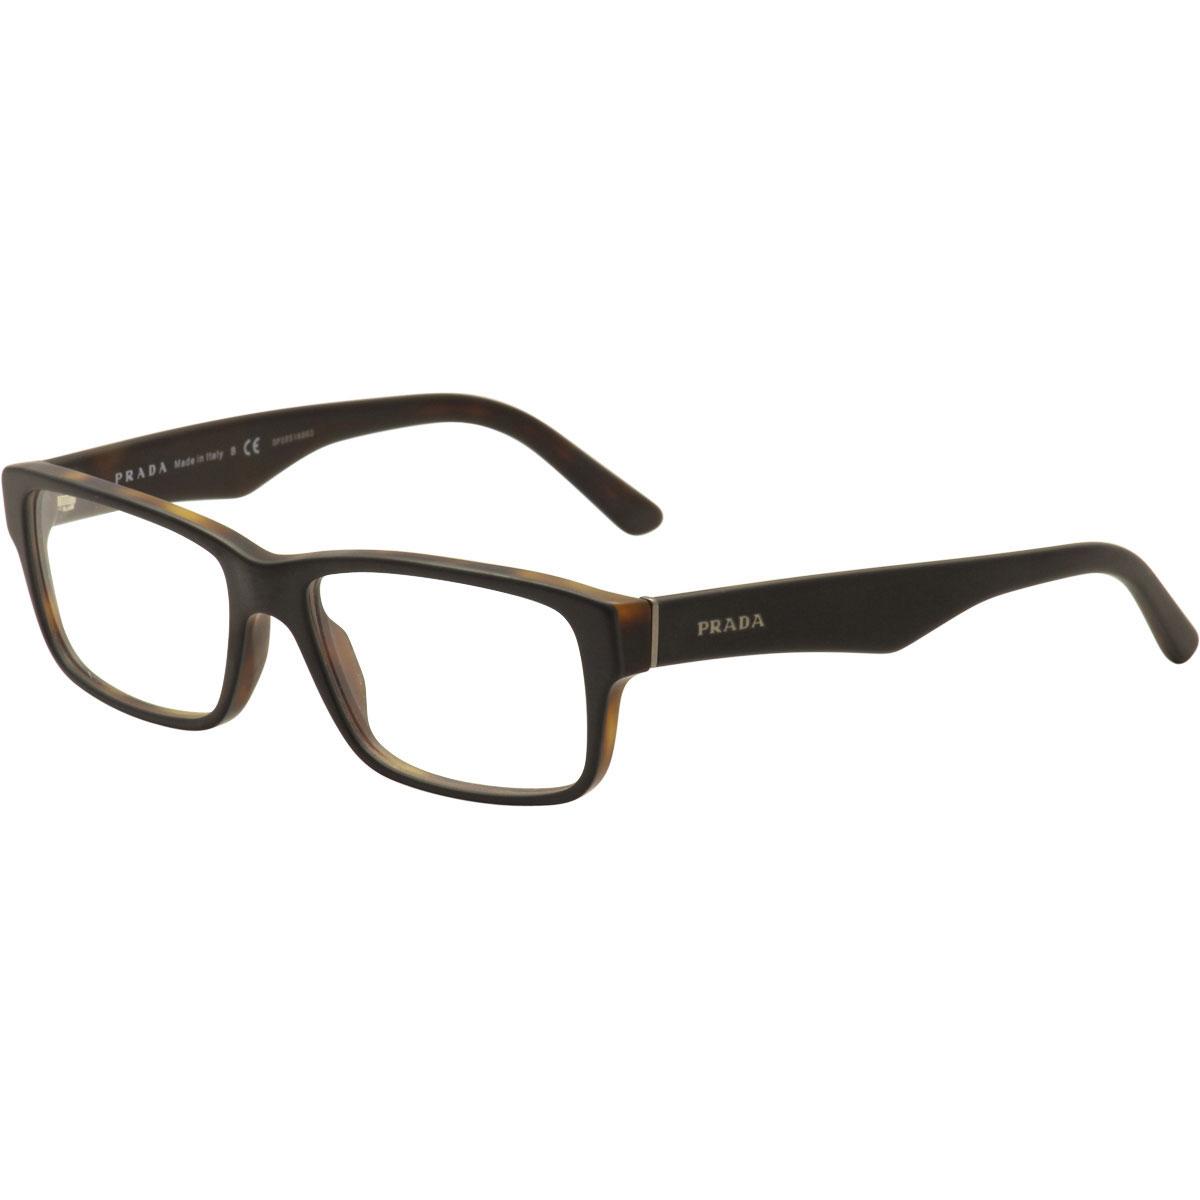 fa42c633a4b9 Prada Eyeglasses VPR16M VPR 16M UBH-1O1 Black Matte Tortoise Optical ...